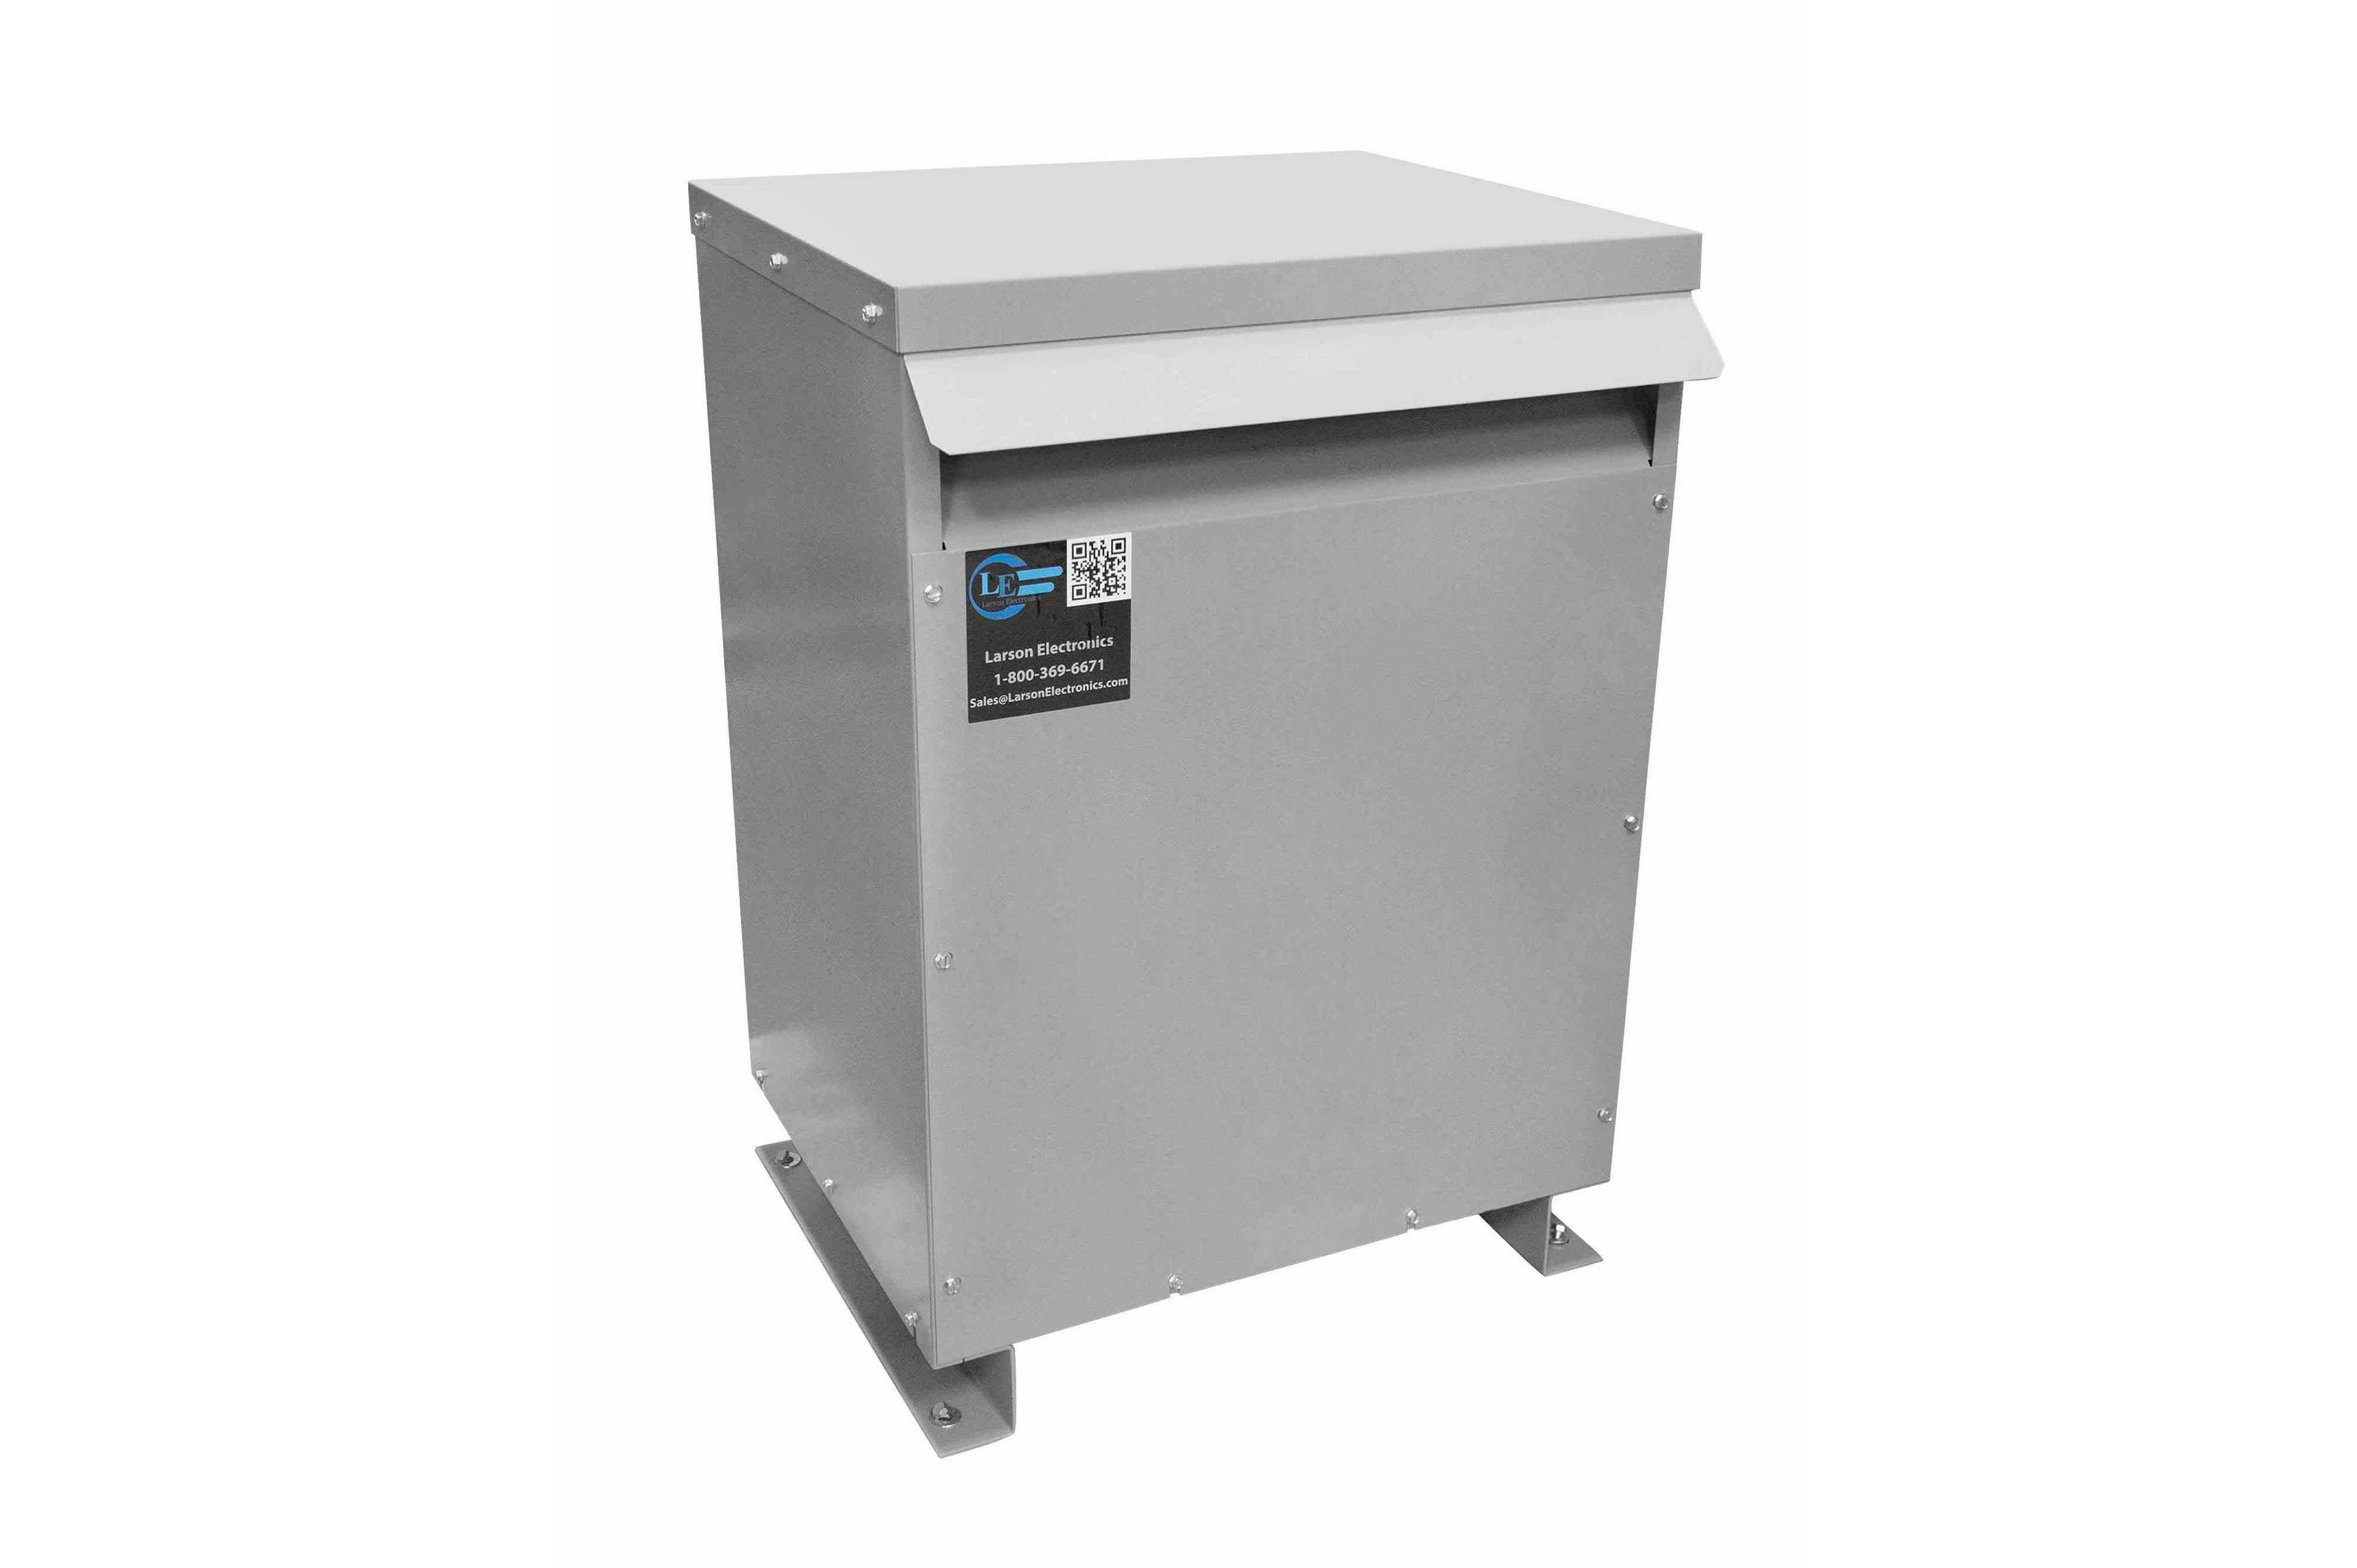 18 kVA 3PH Isolation Transformer, 400V Wye Primary, 240V Delta Secondary, N3R, Ventilated, 60 Hz